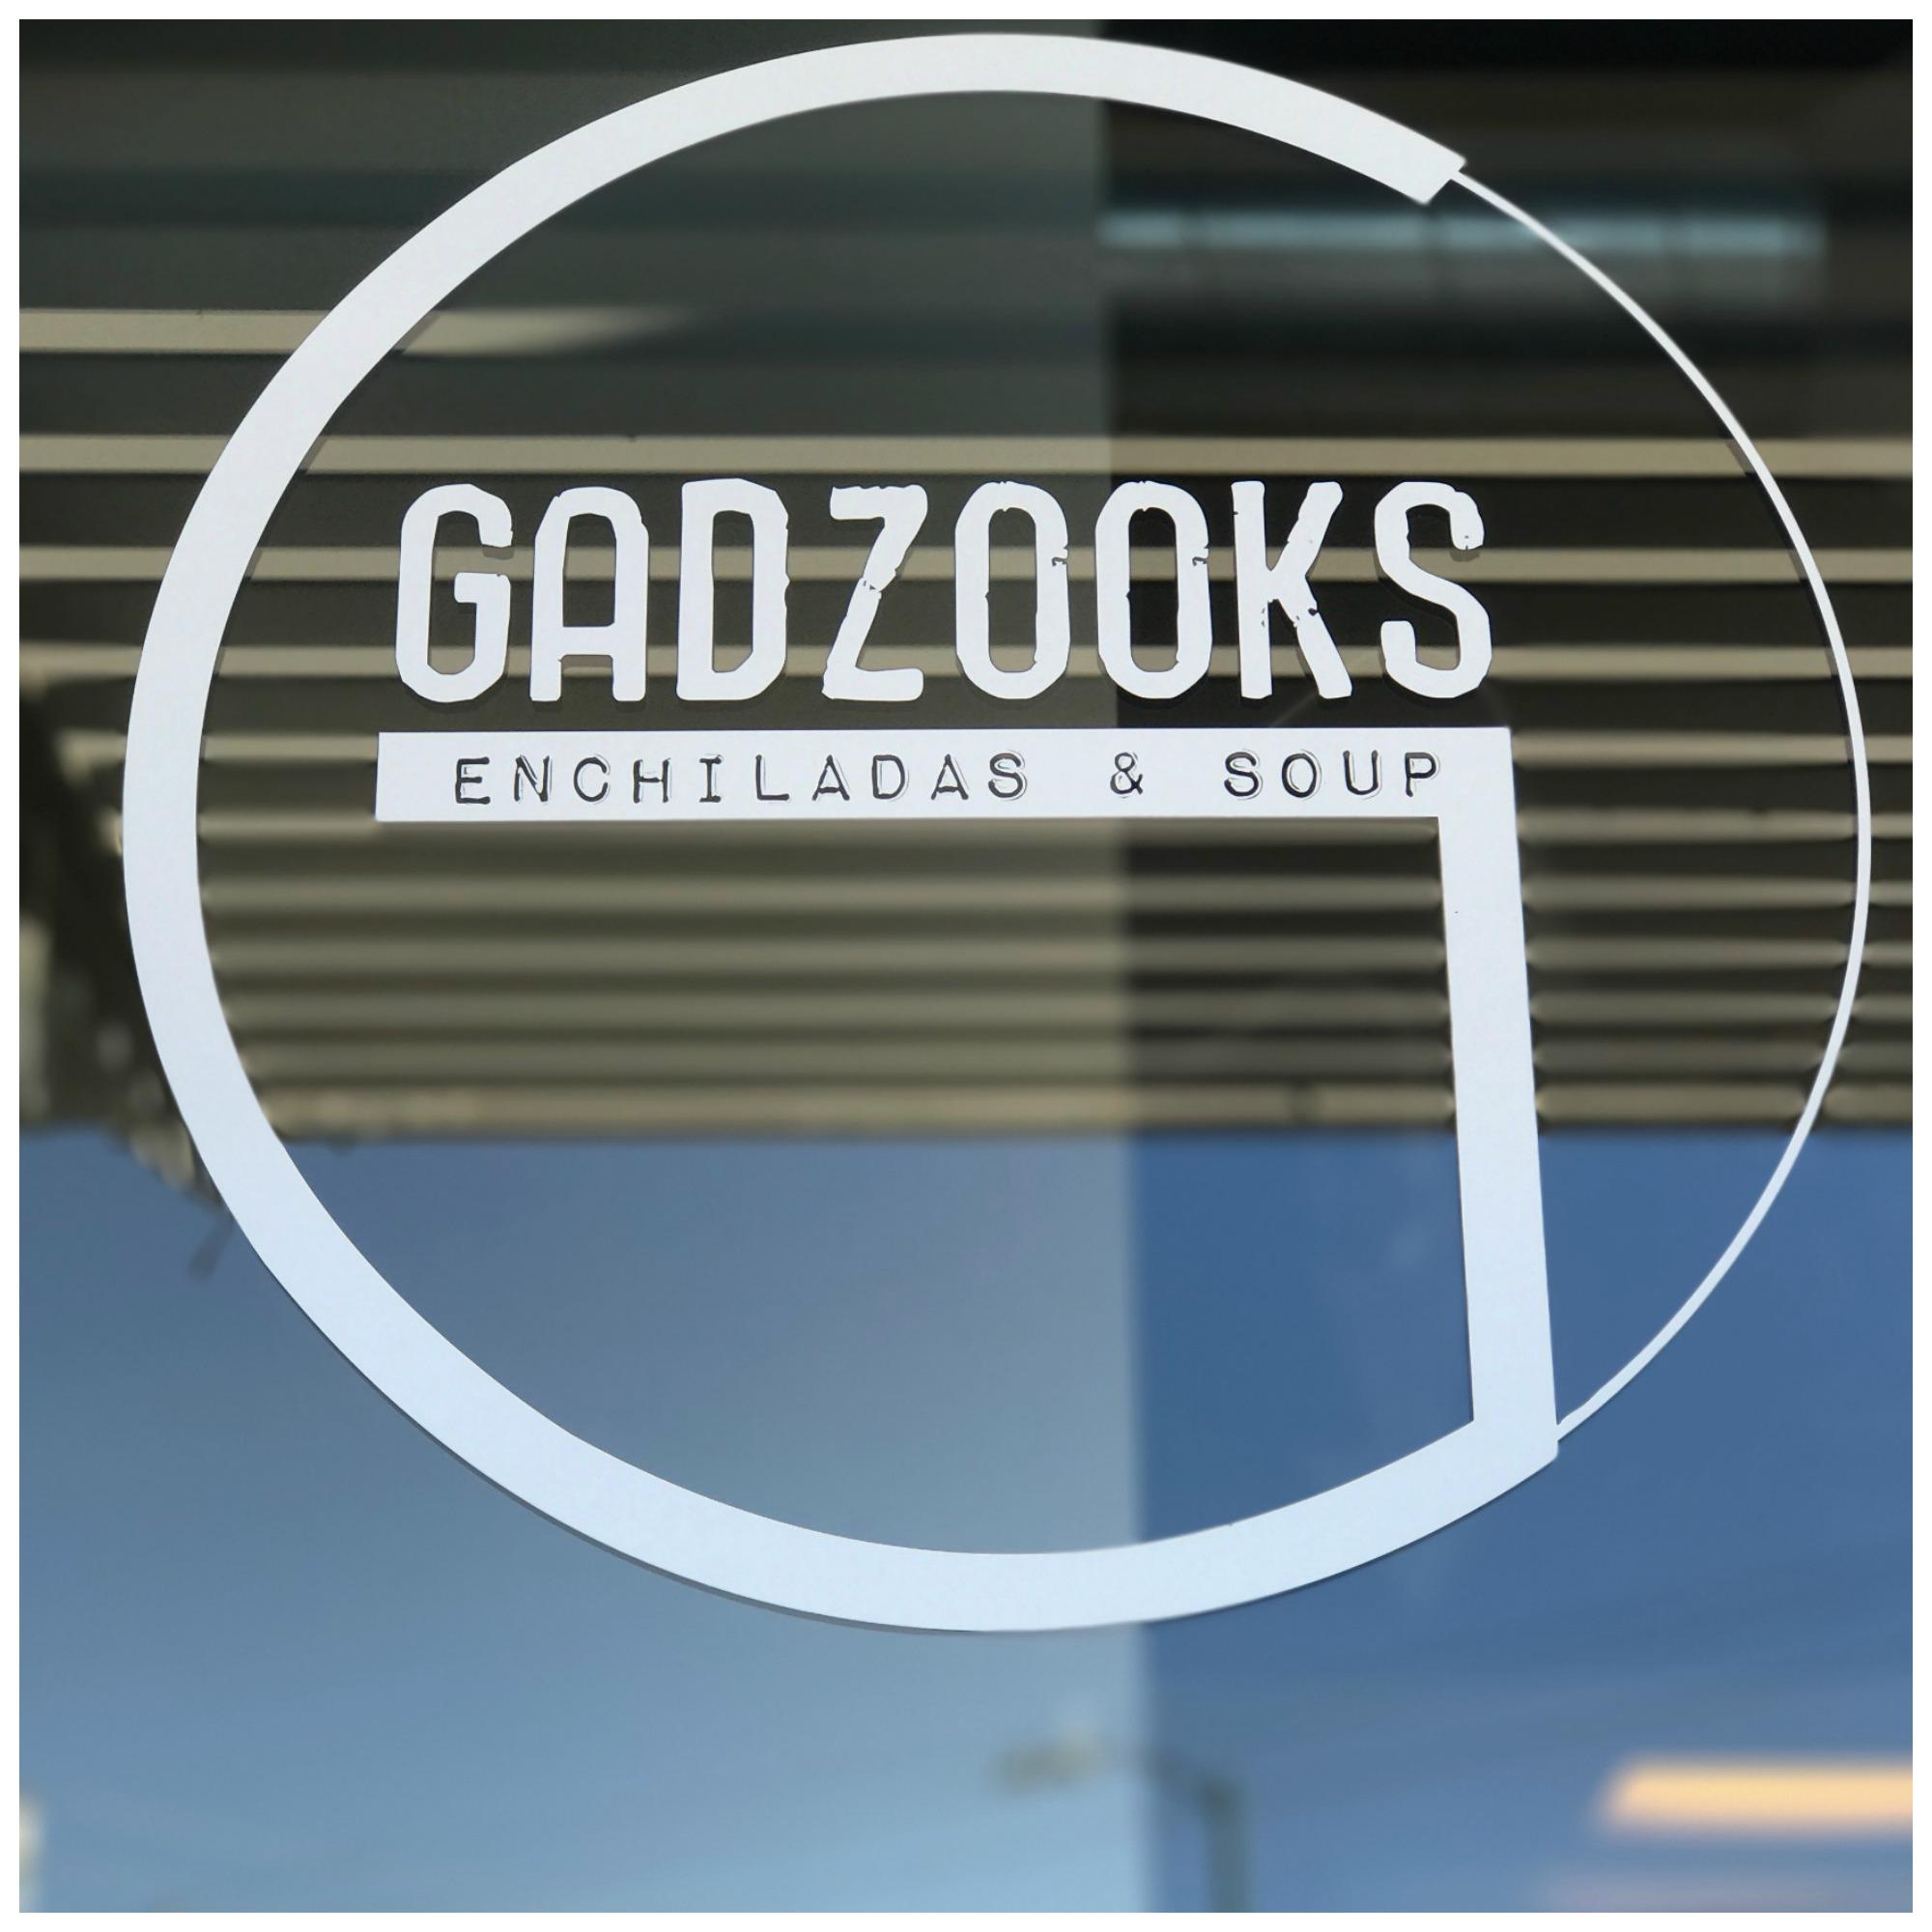 CitS_Gadzooks_Logo_resize